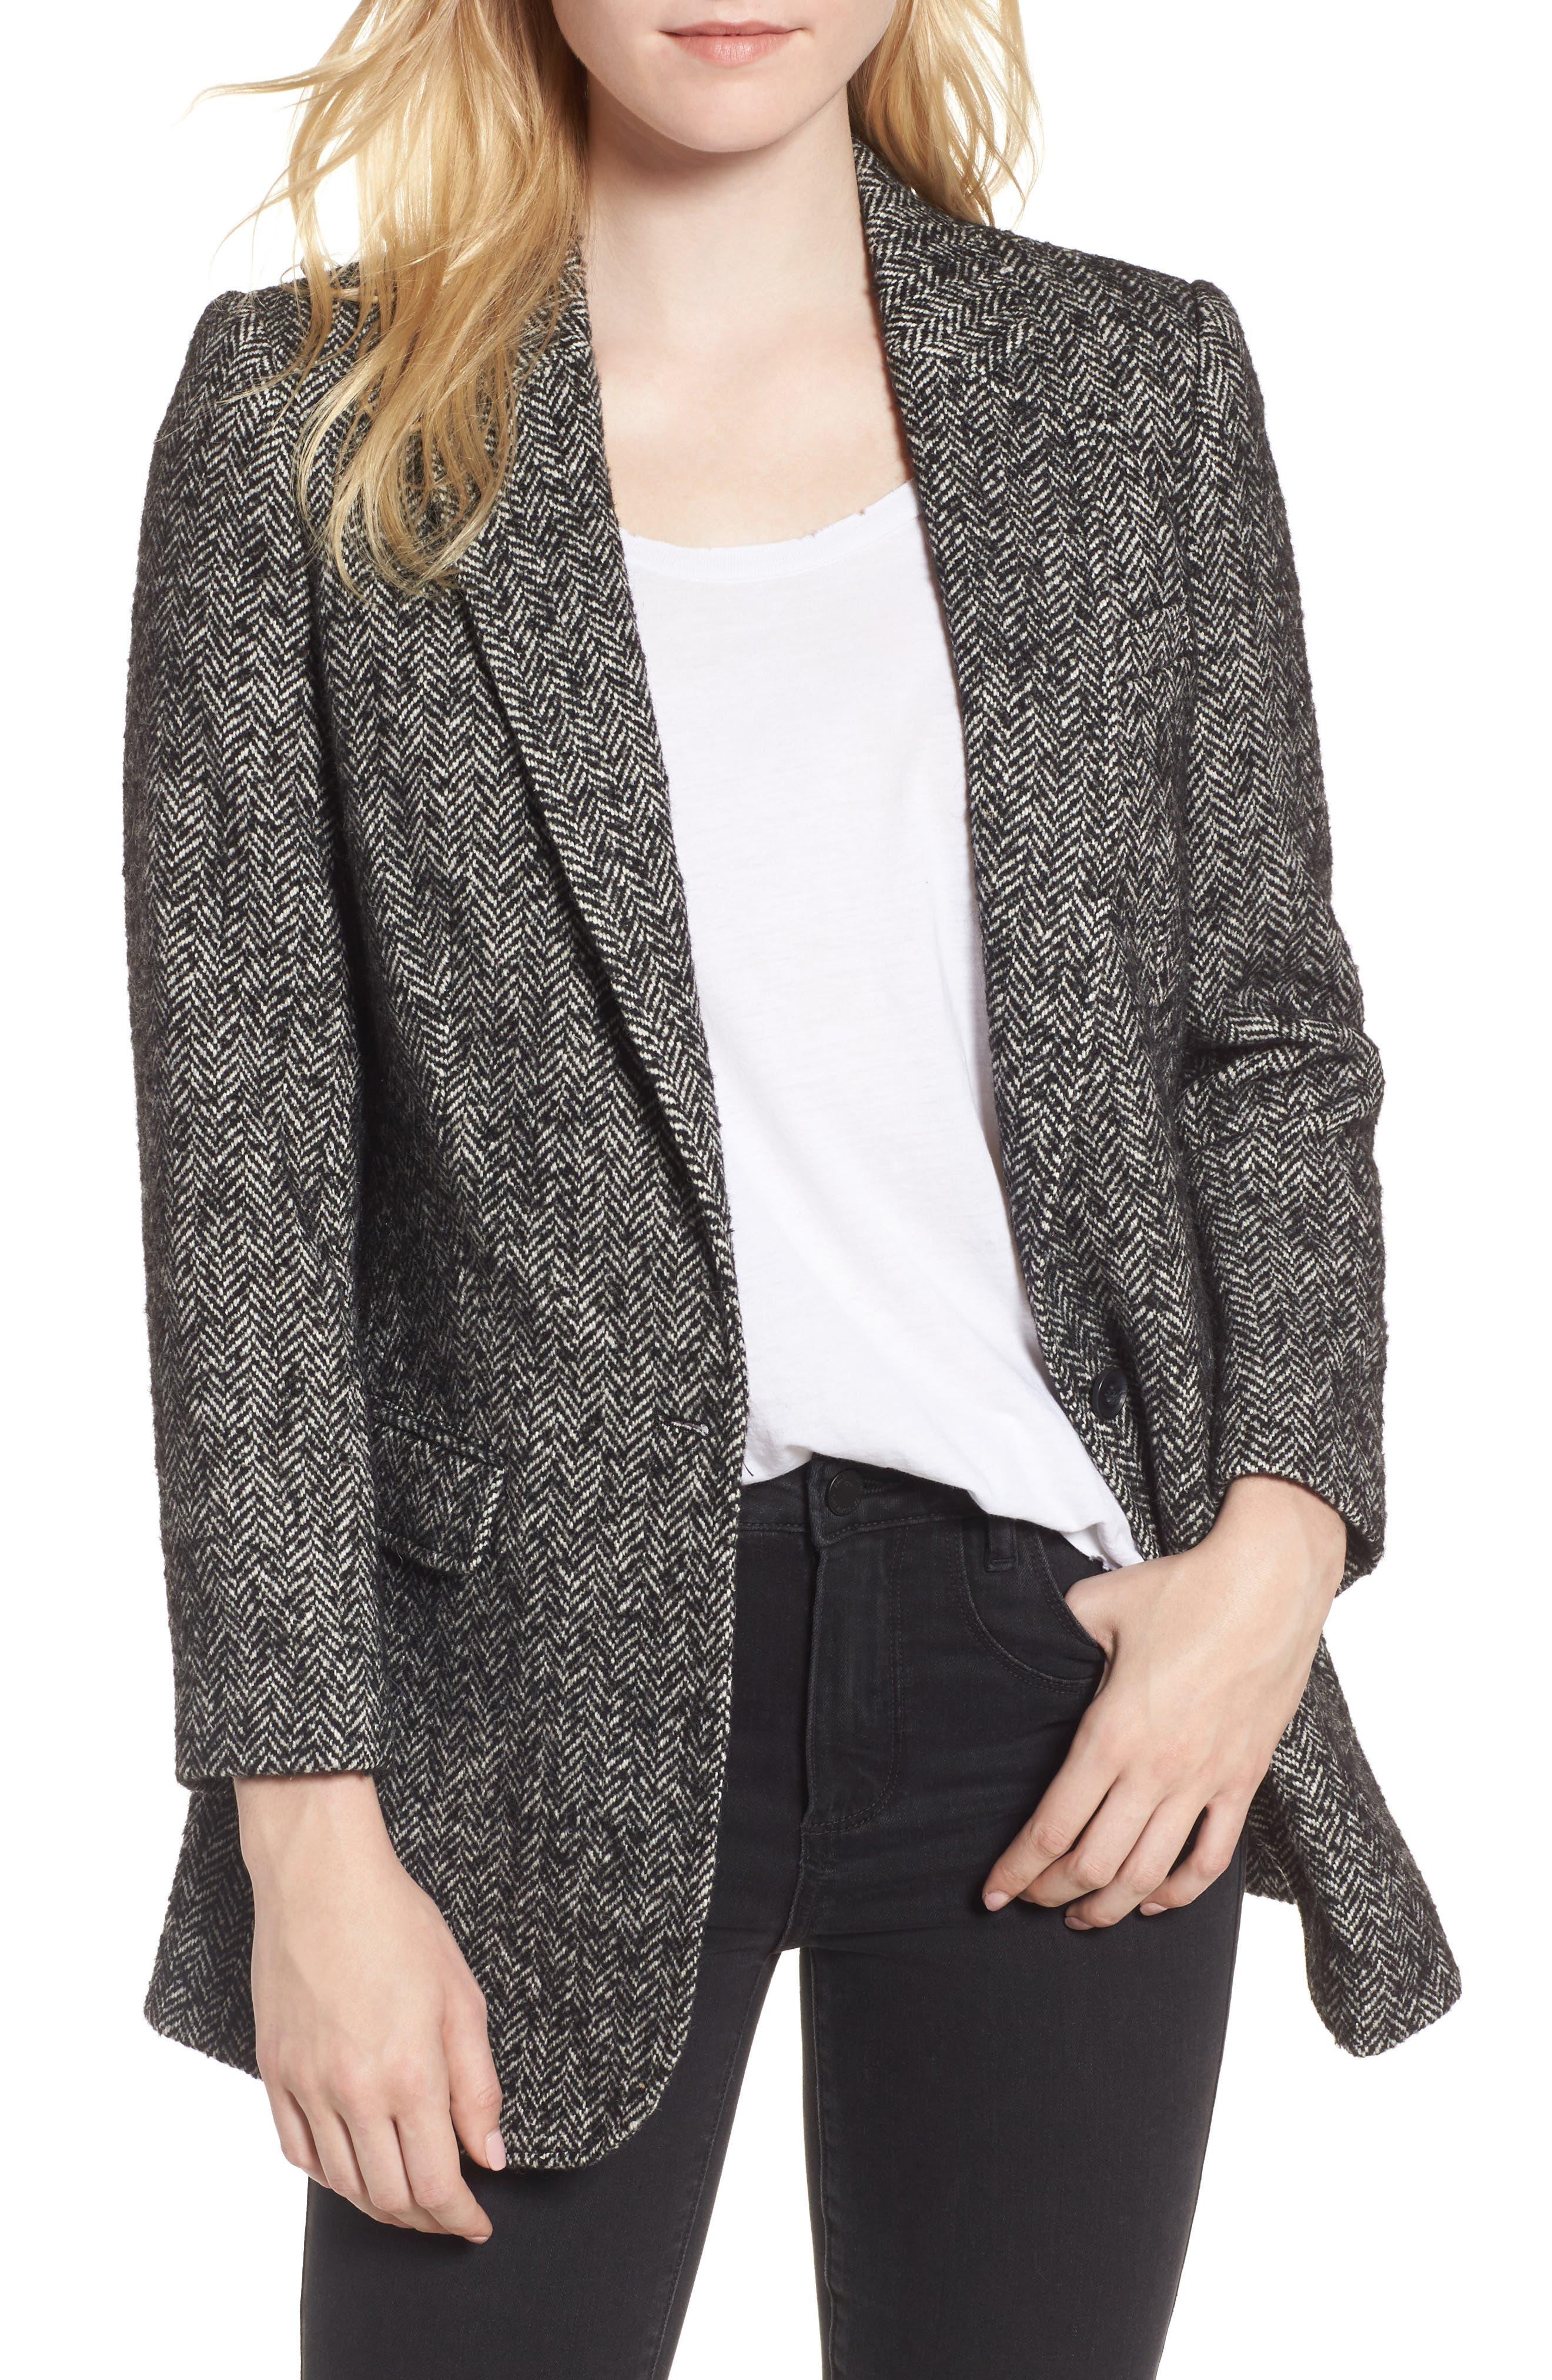 Merilee Jacket,                         Main,                         color, Black/ Cream